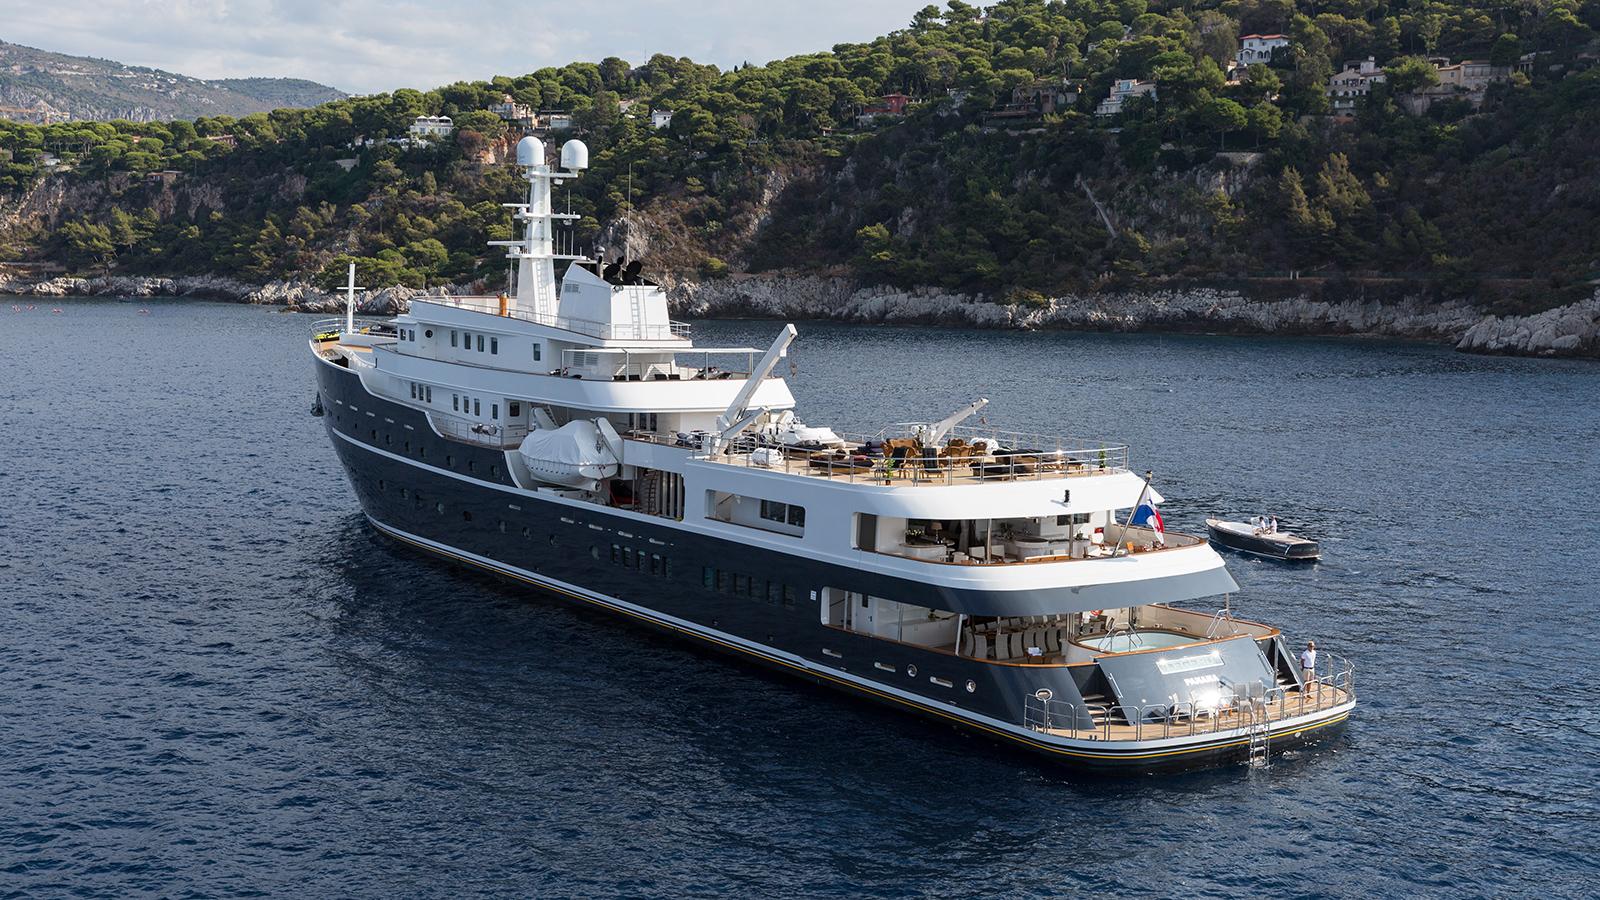 aft-view-of-ihc-explorer-yacht-legend